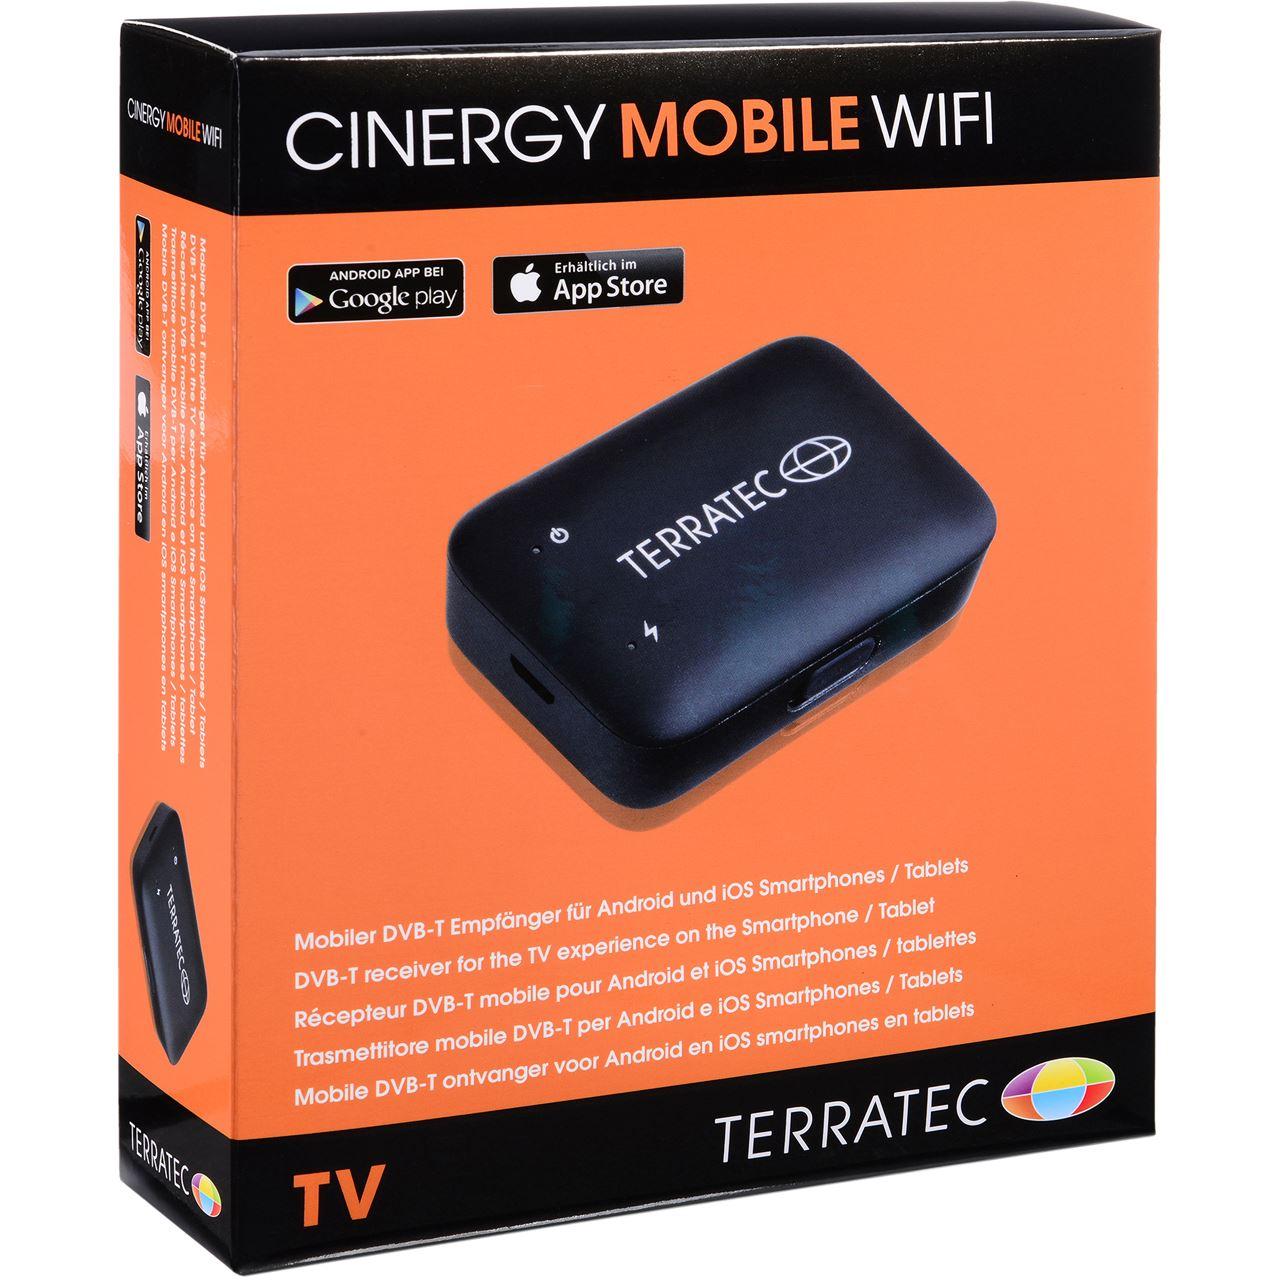 terratec cinergy mobile wifi wifi dvb t box. Black Bedroom Furniture Sets. Home Design Ideas